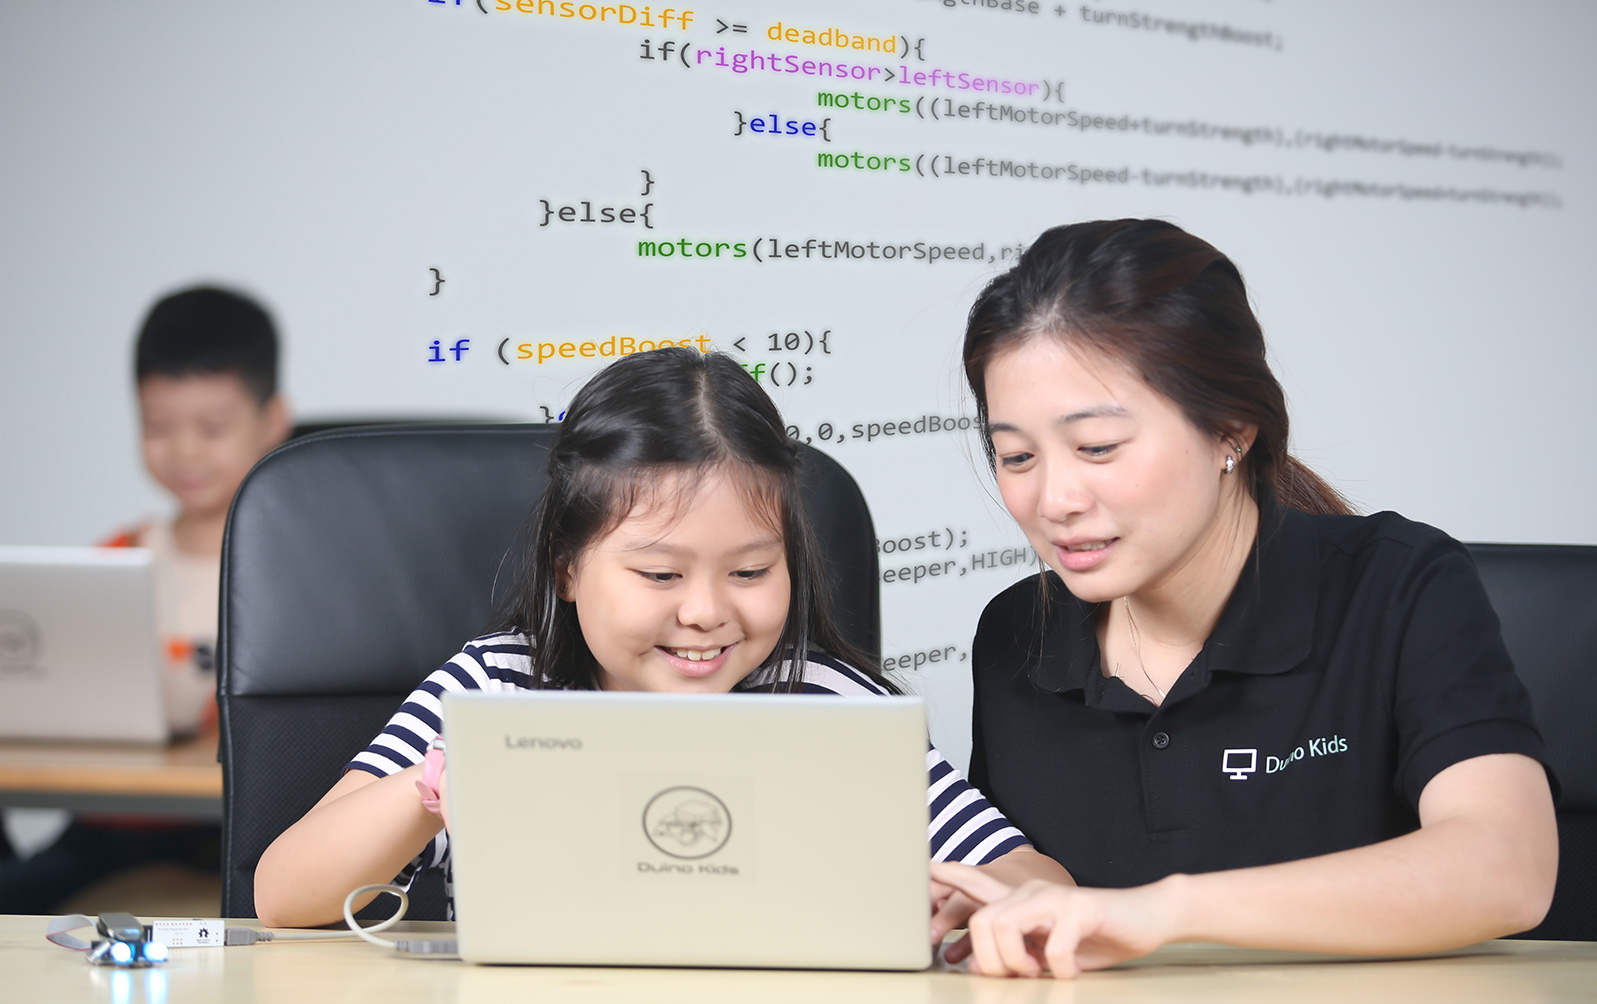 Duino_Kids_coding_classes